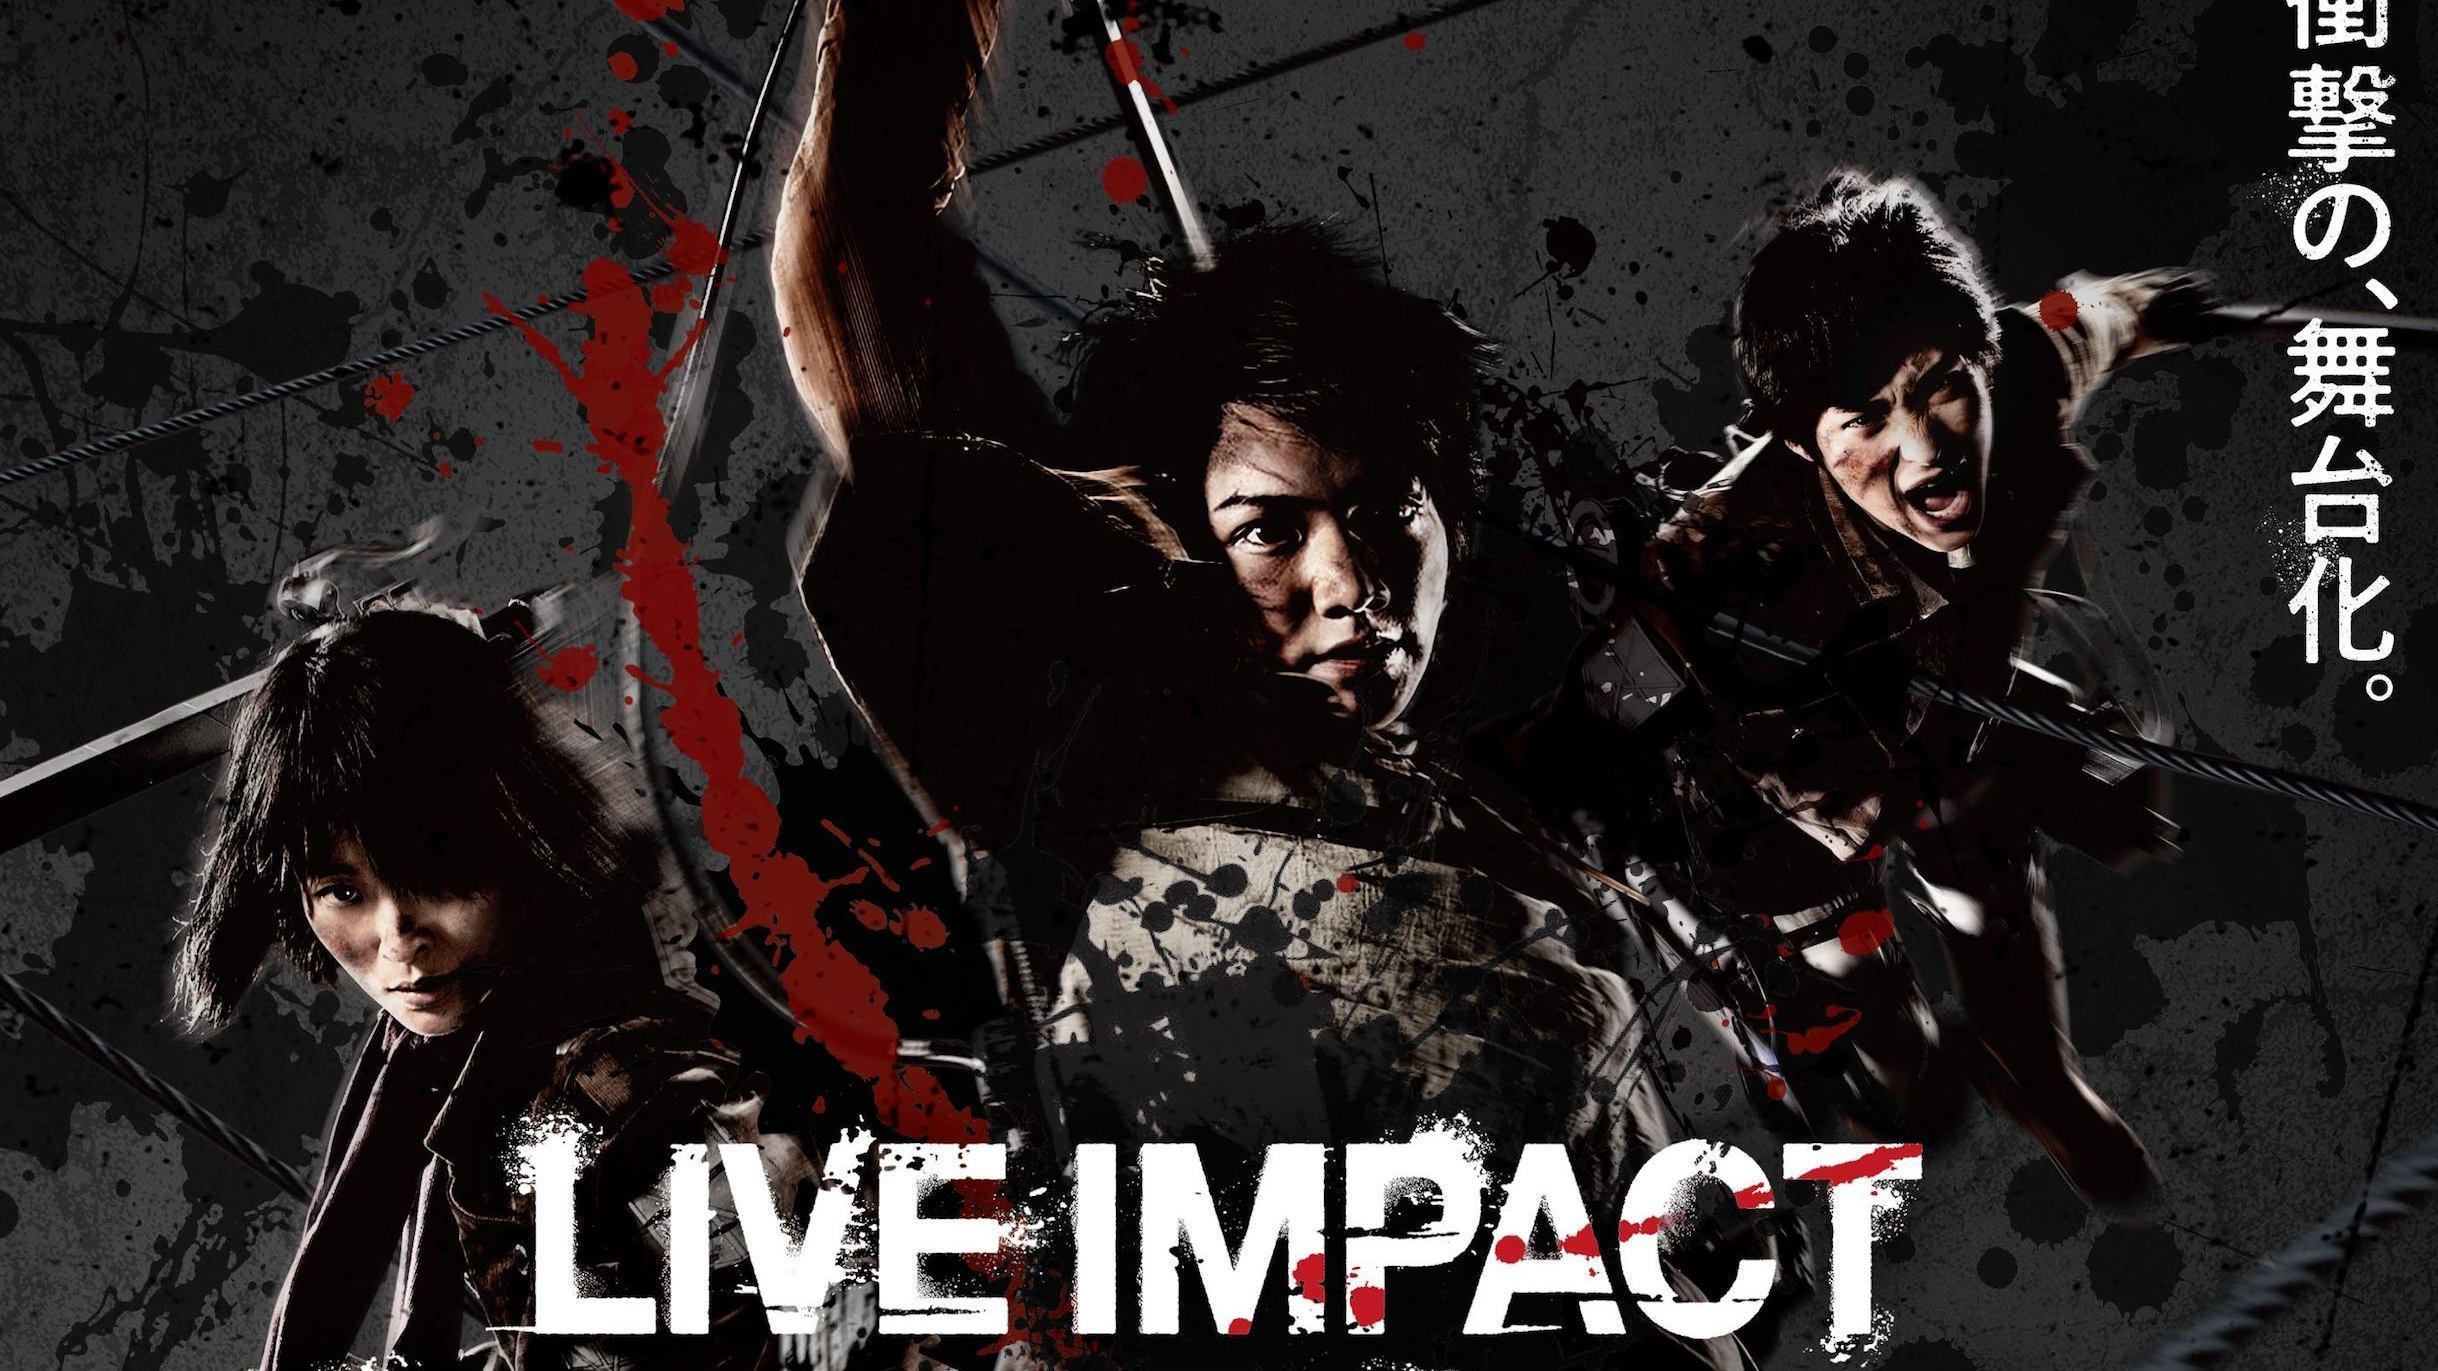 Actor Kazutaka Yoshino dies from injuries he got while filming Attack on Titan